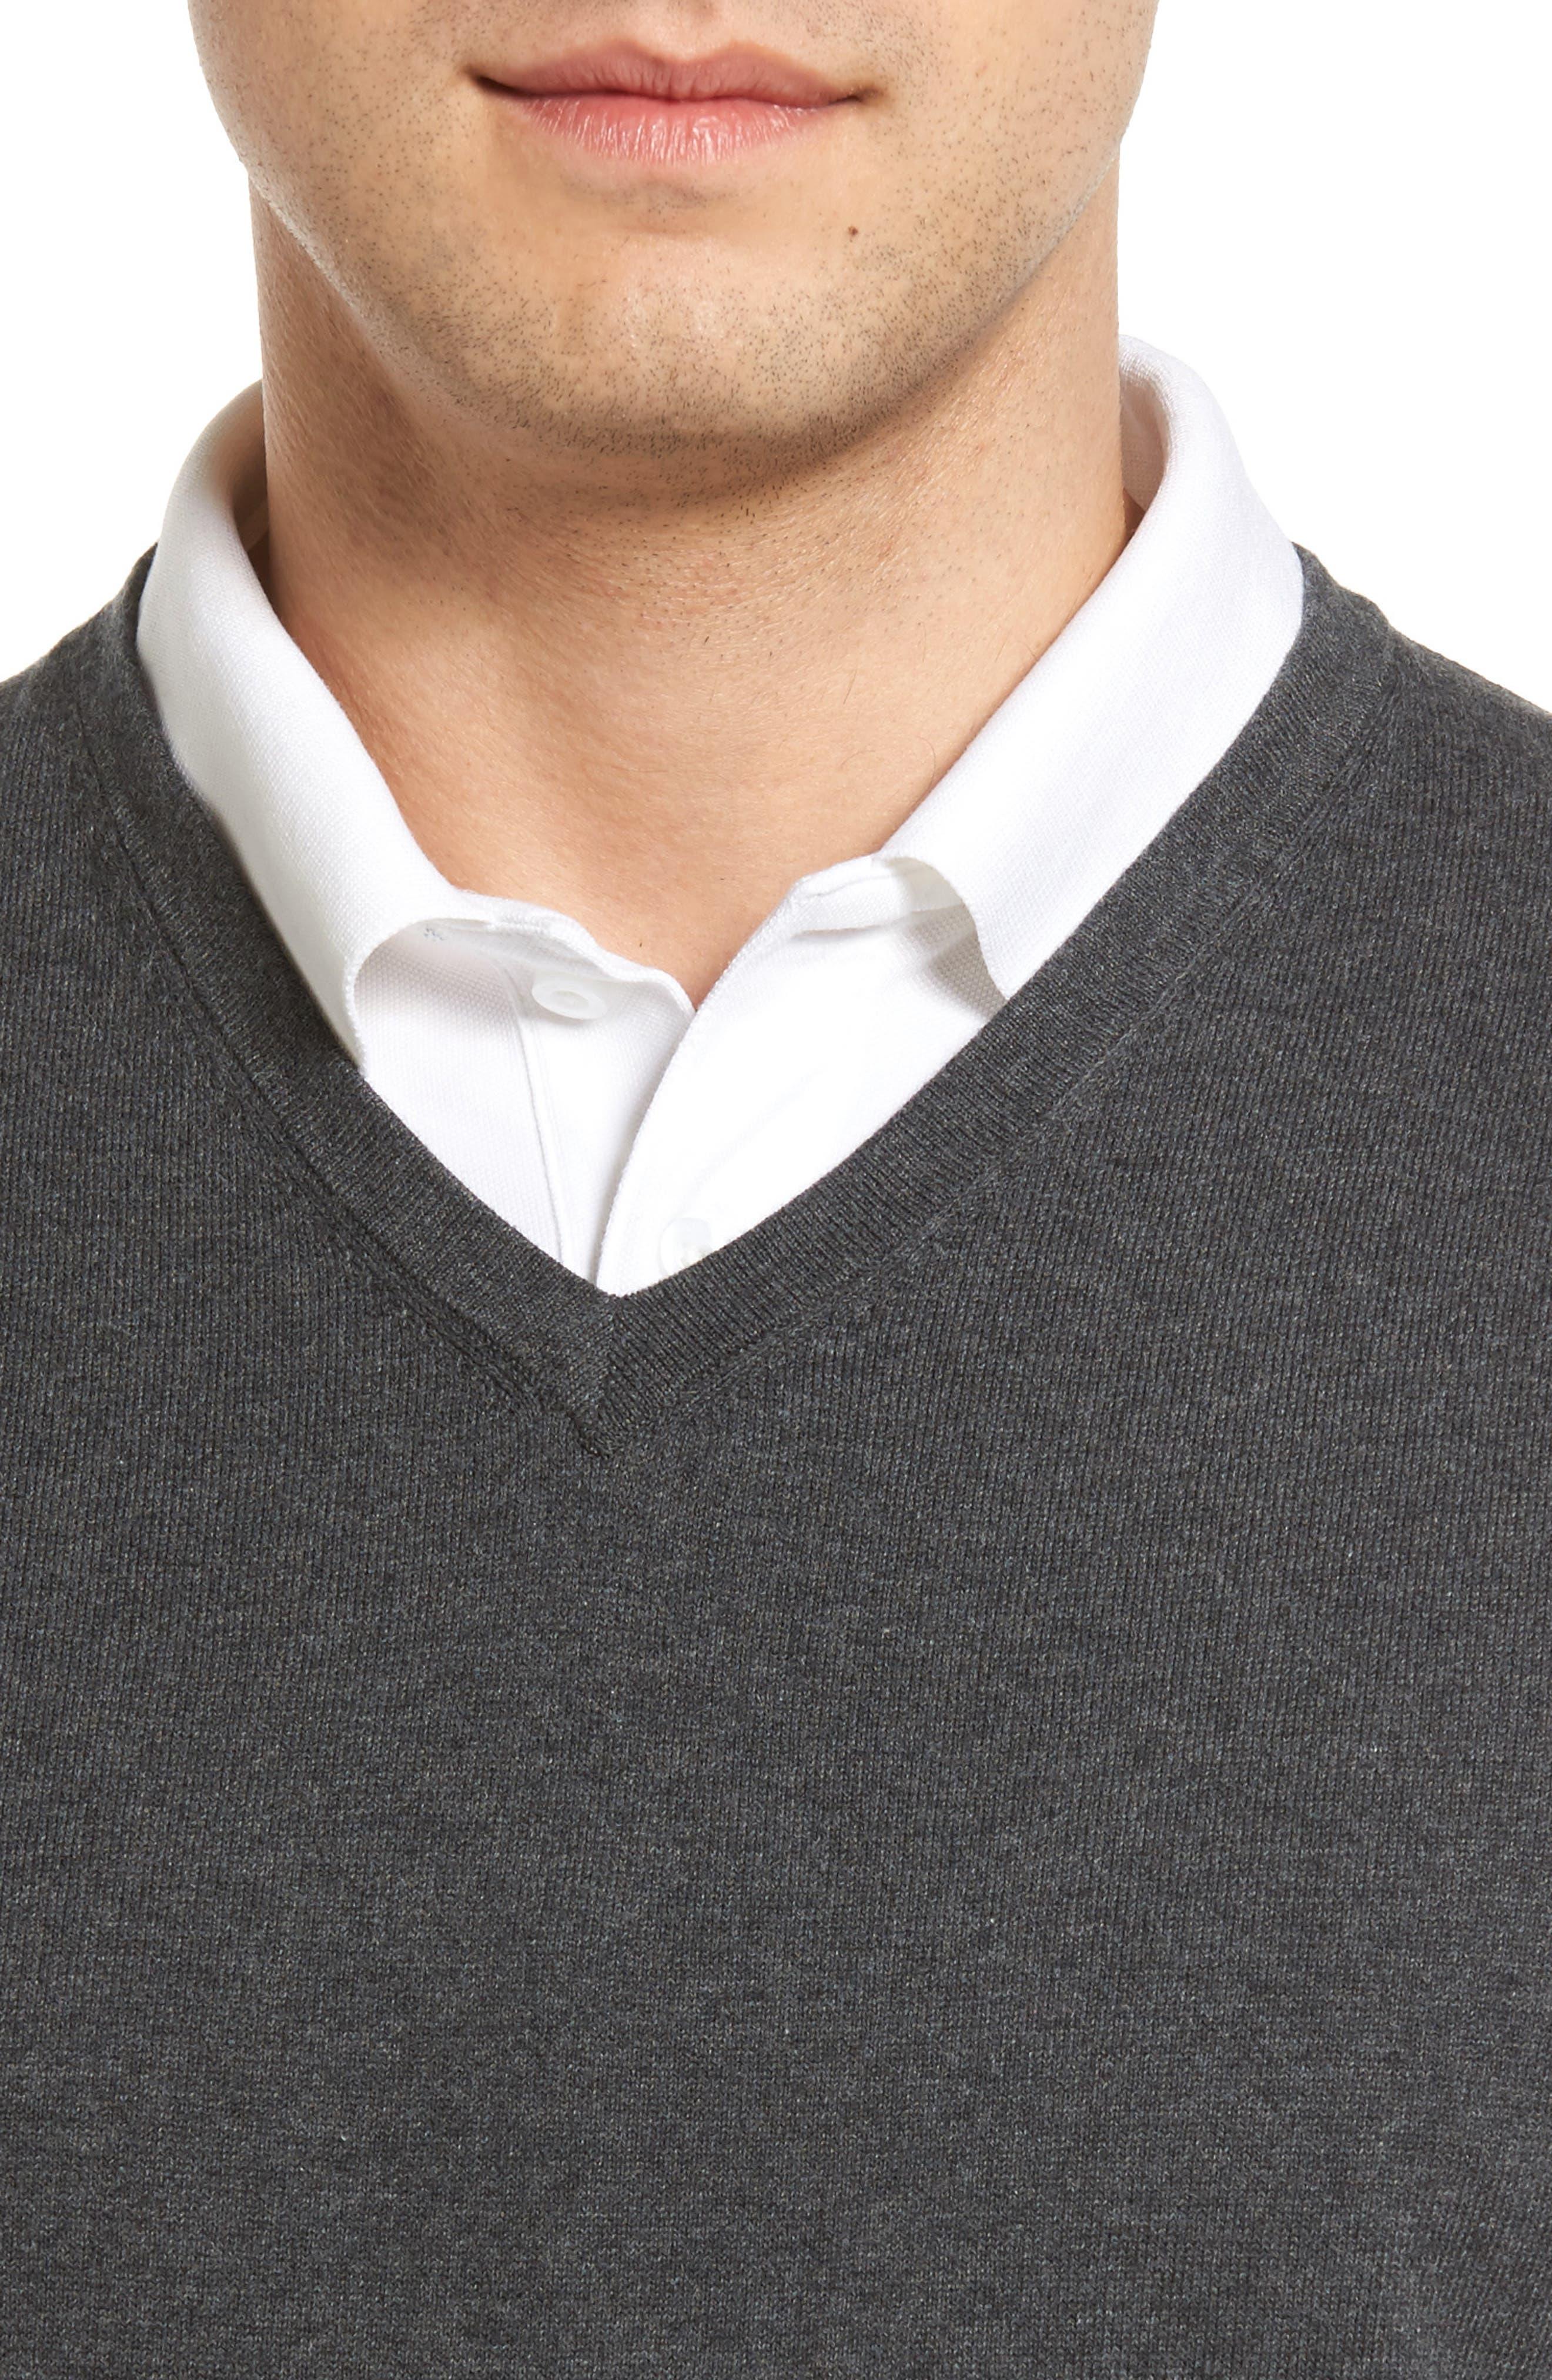 Lakemont V-Neck Sweater Vest,                             Alternate thumbnail 4, color,                             CHARCOAL HEATHER